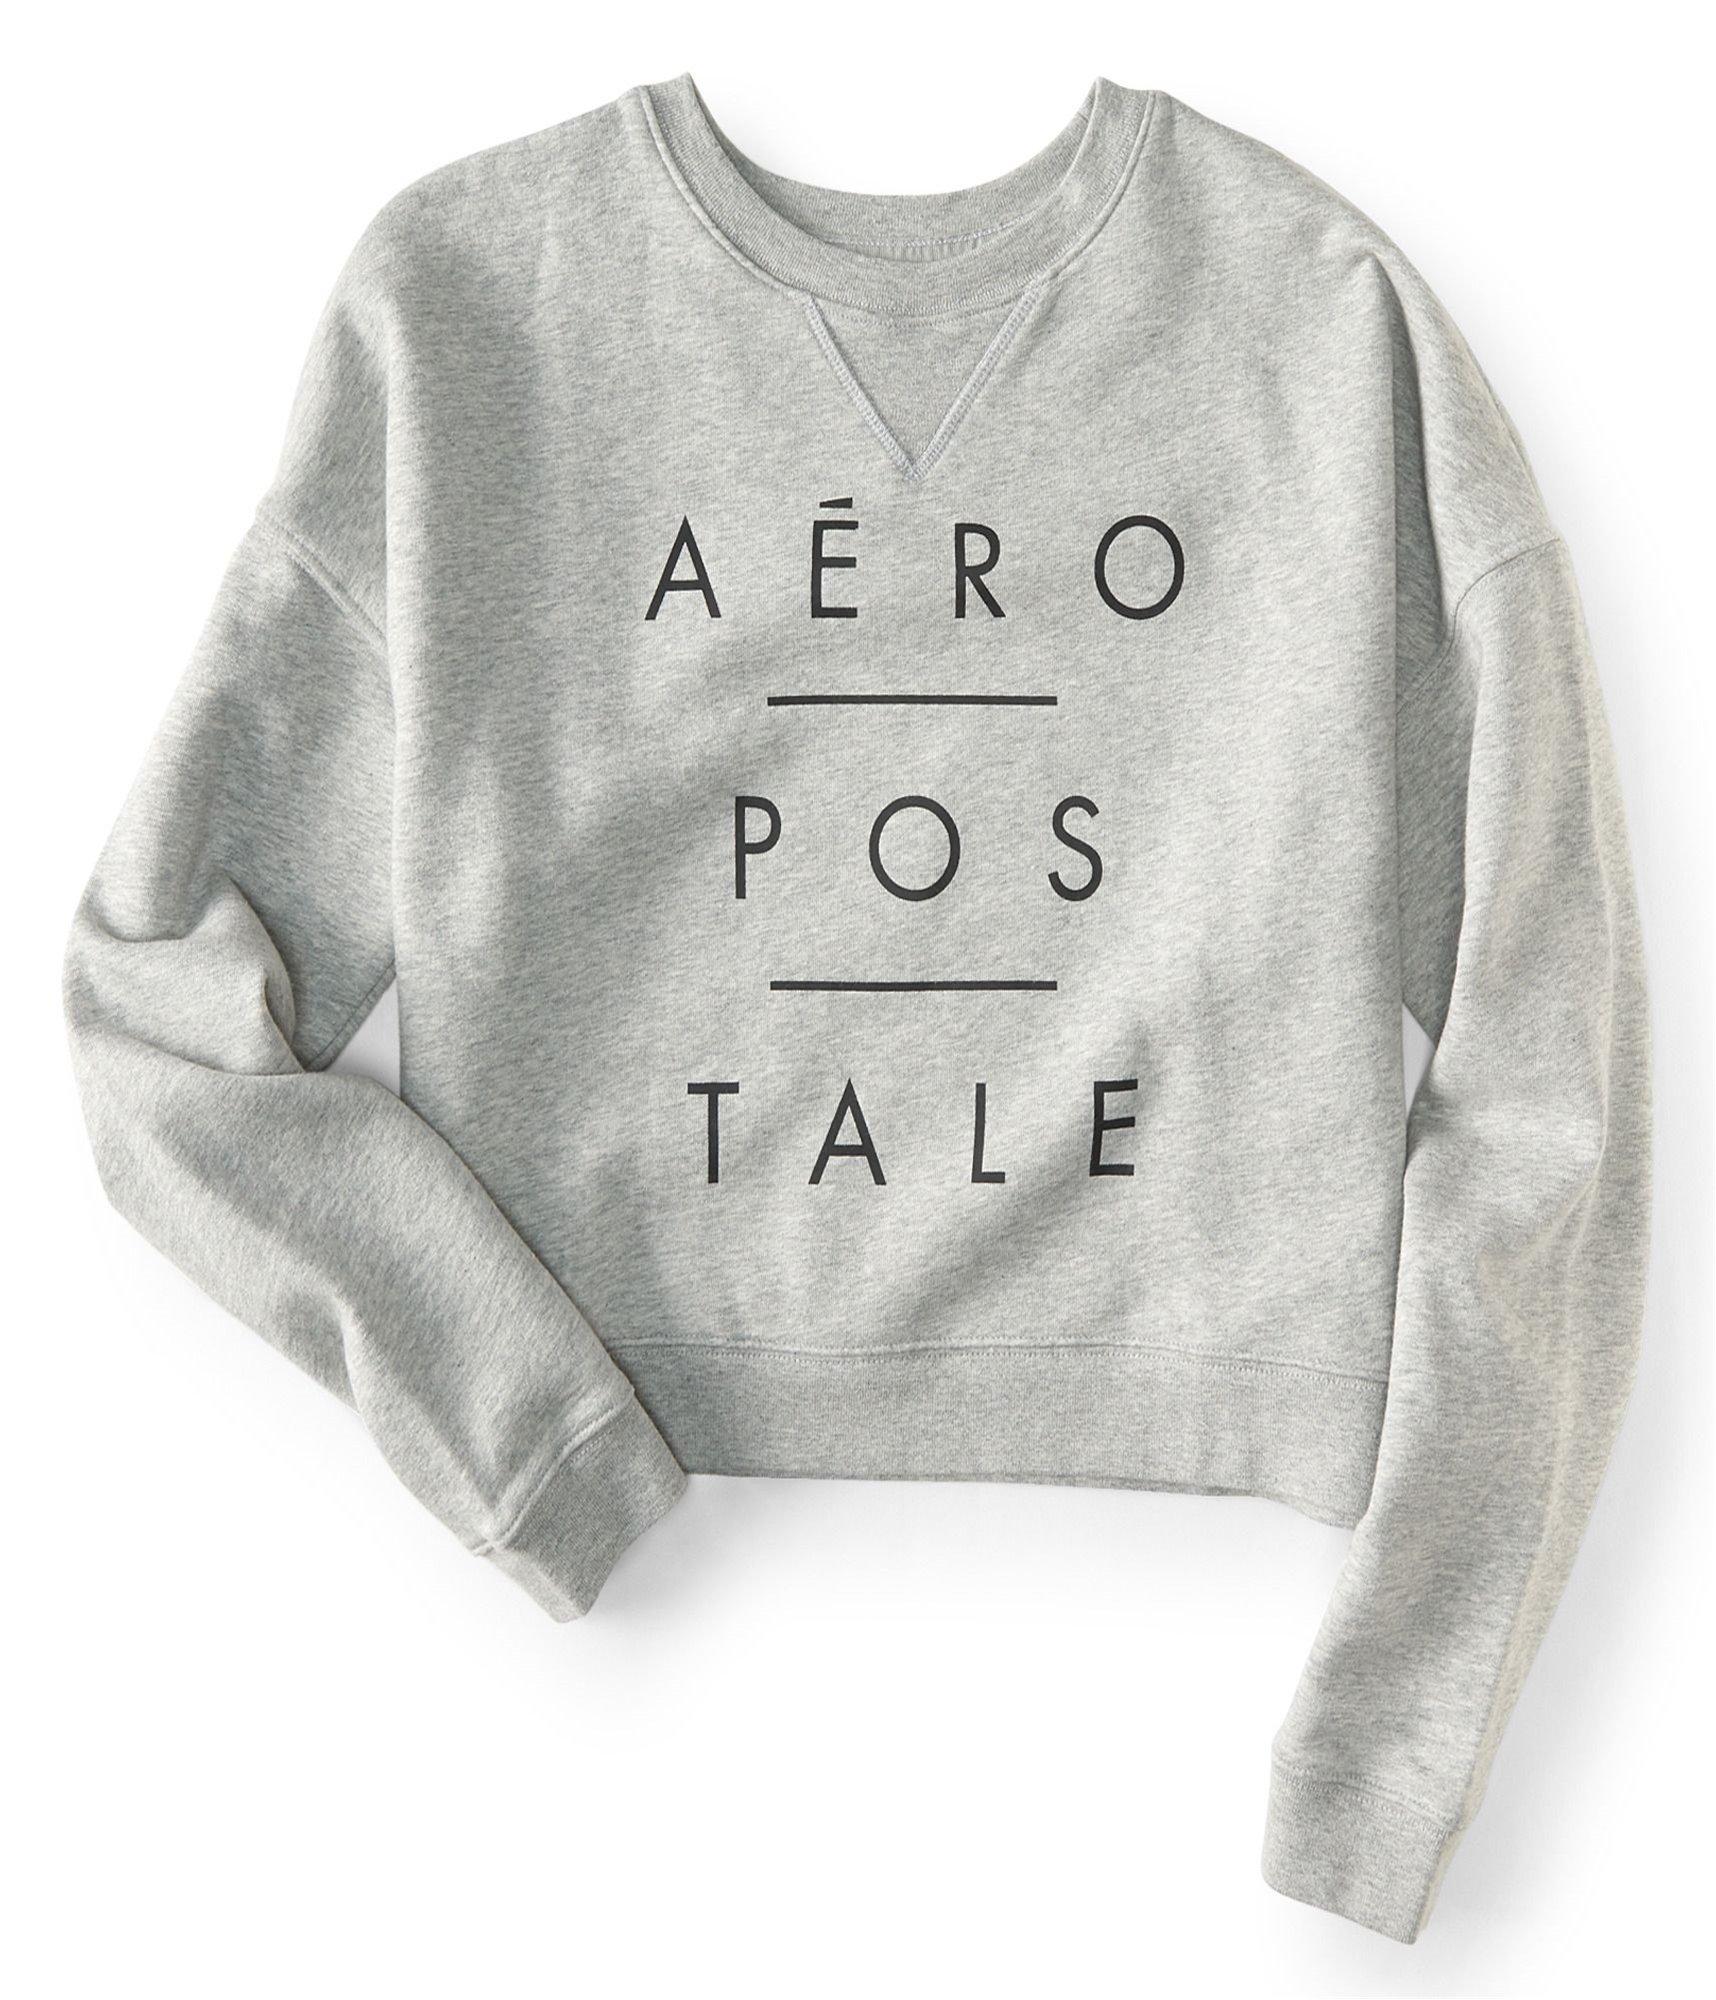 Aeropostale Womens Logo Sweatshirt Grey S - Juniors by Aeropostale (Image #1)